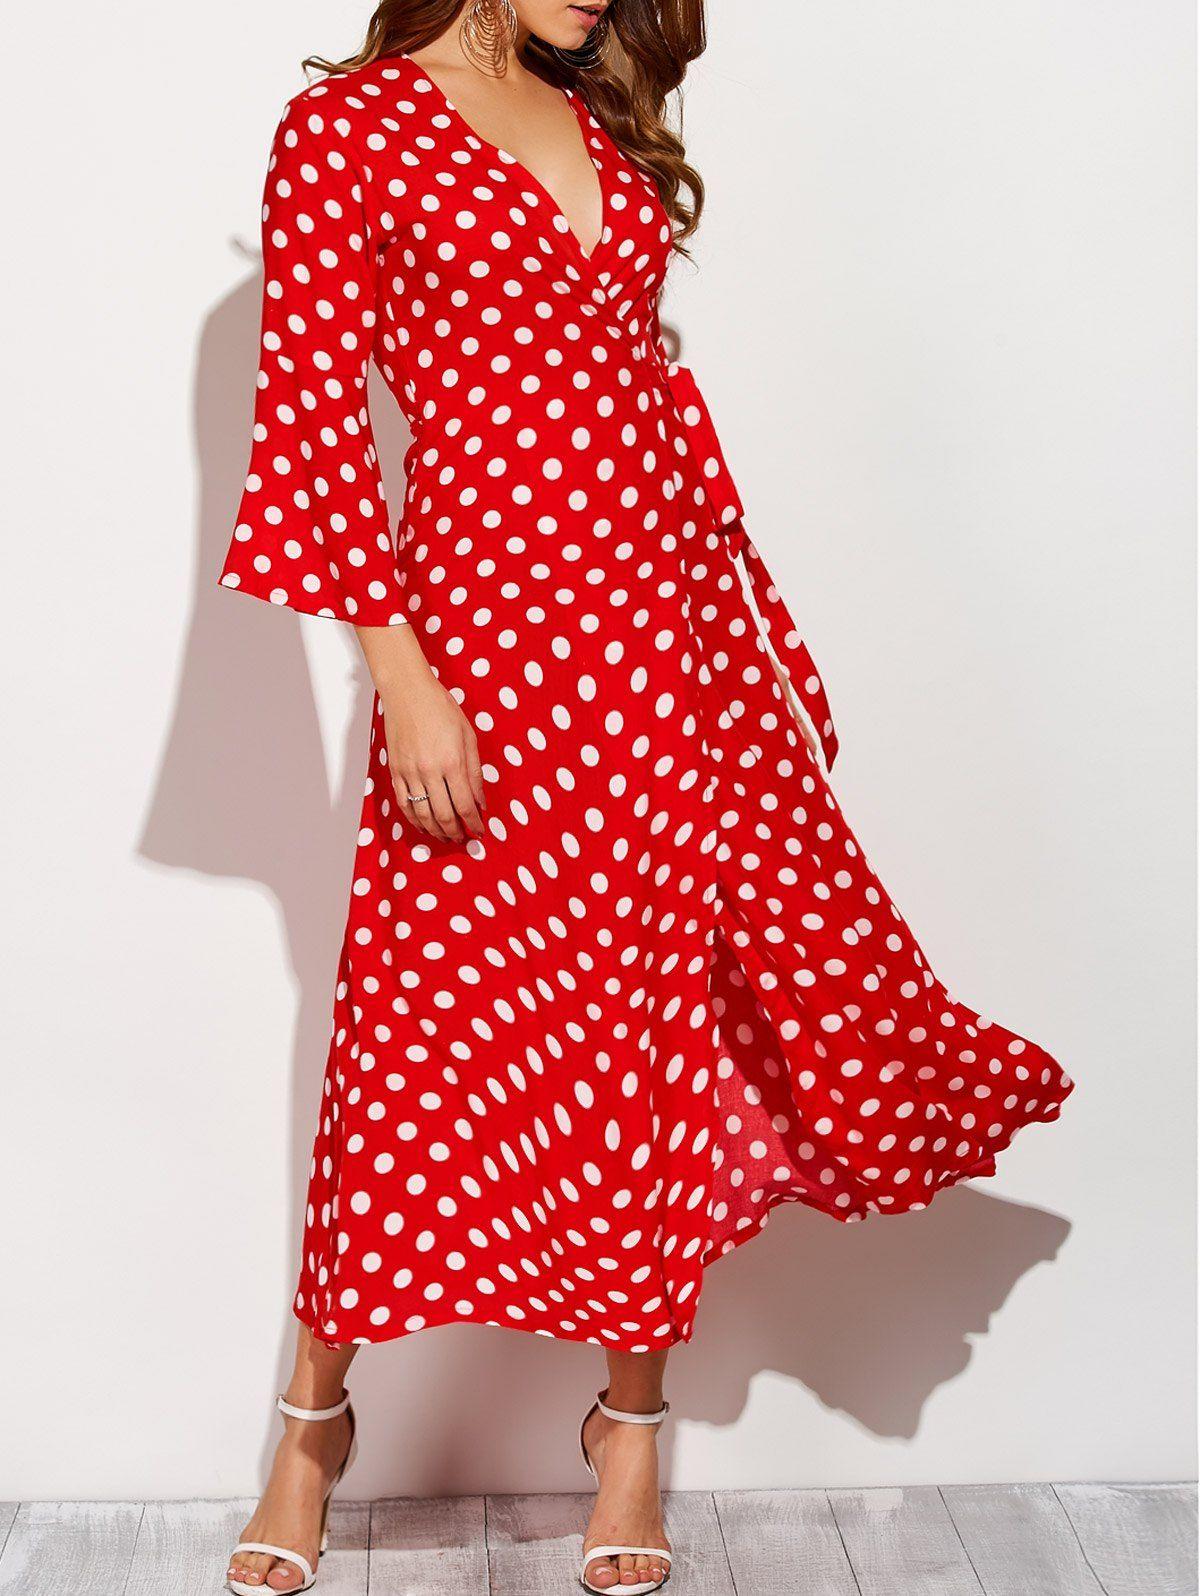 19+ Red and white polka dot dress info